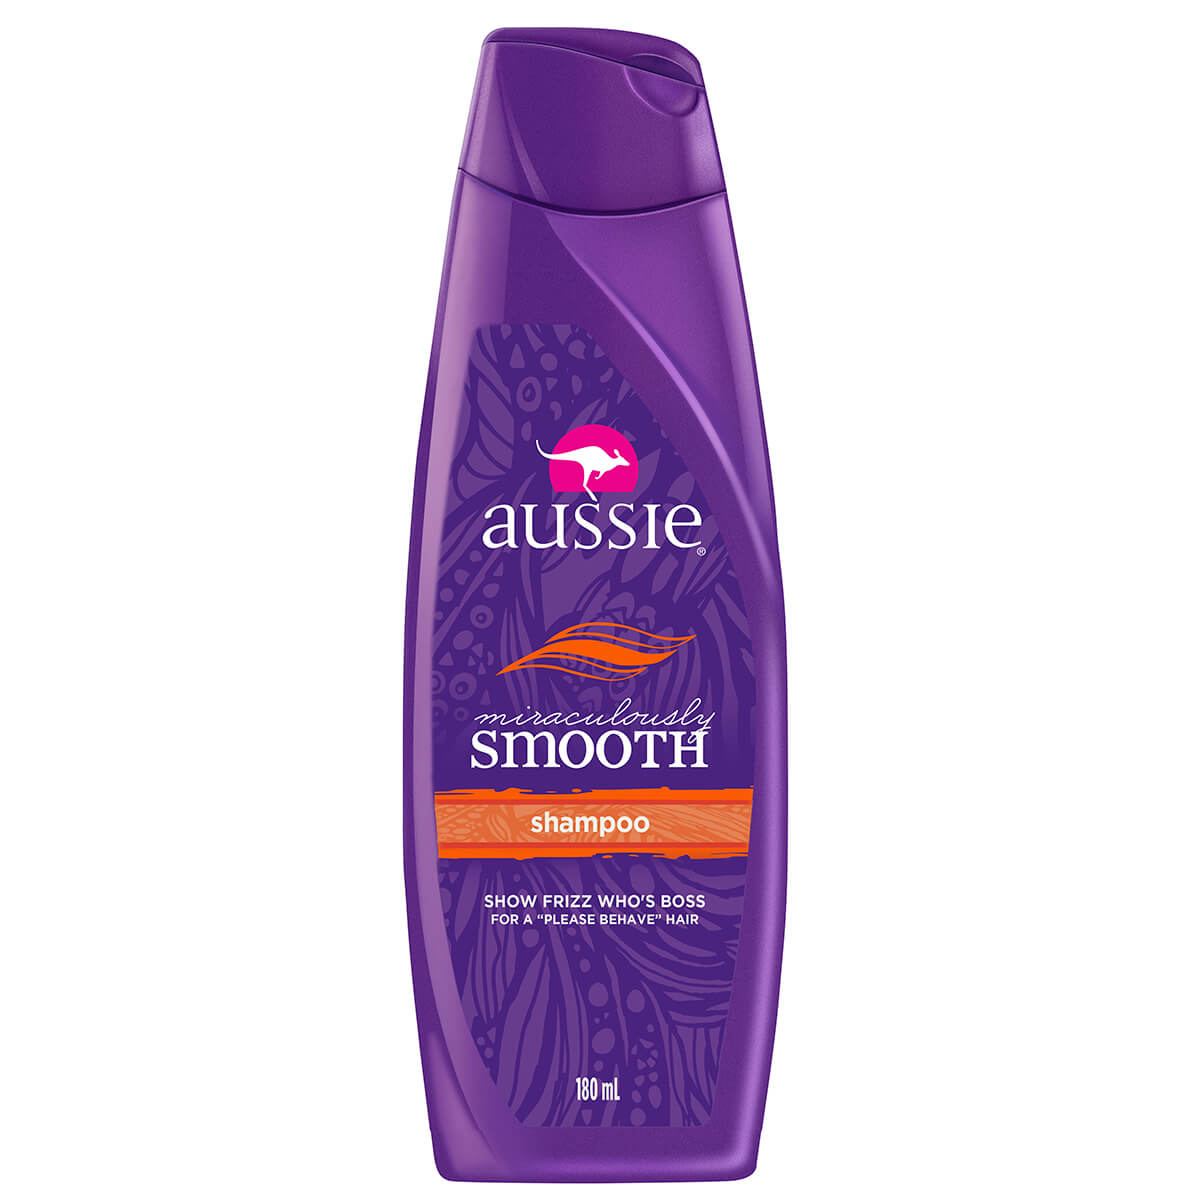 Shampoo Aussie Miraculously Smooth 180ml